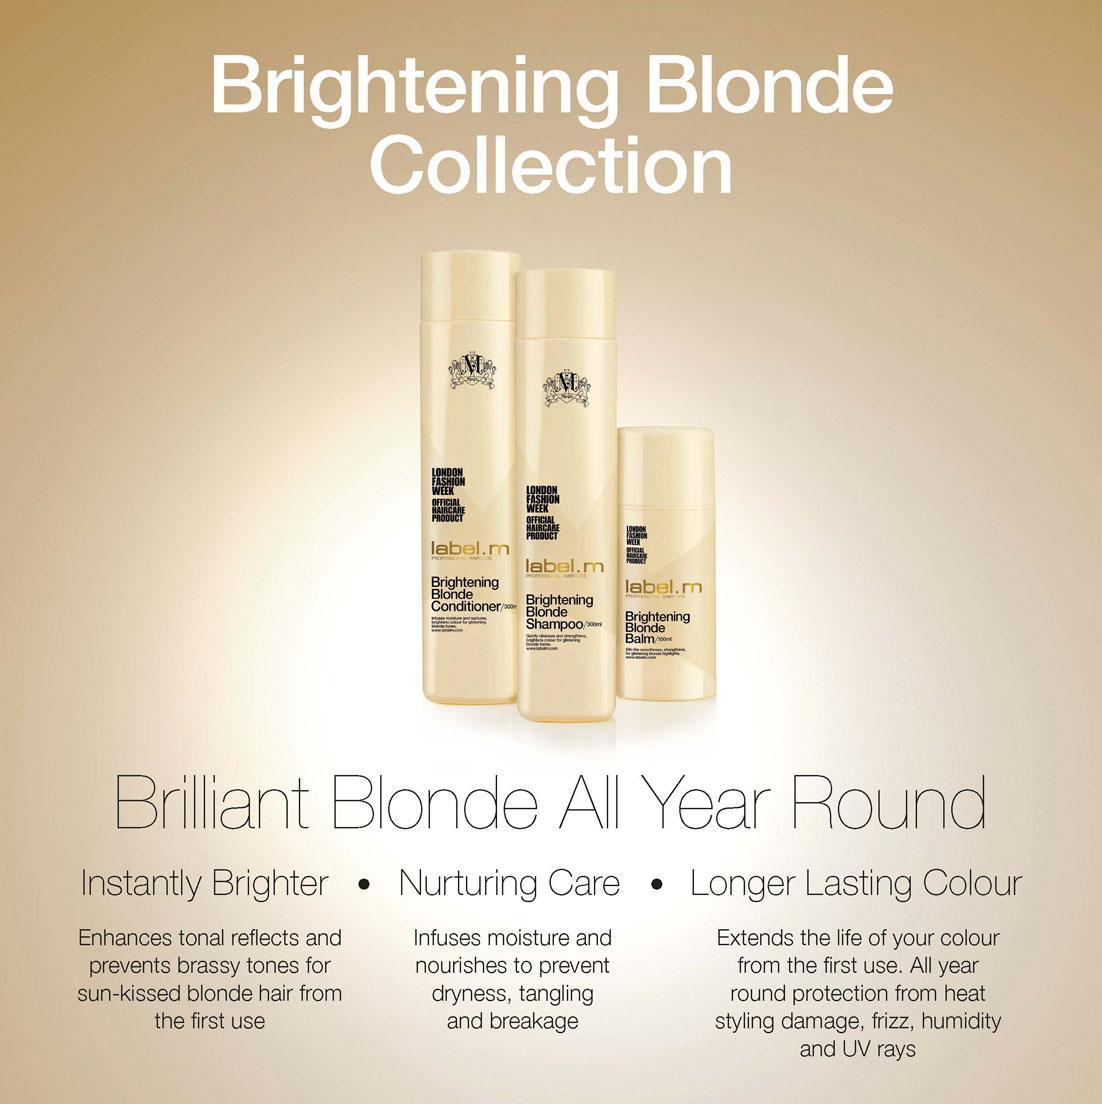 587.9-label-m-brightening-blonde-1-pg-38.jpg